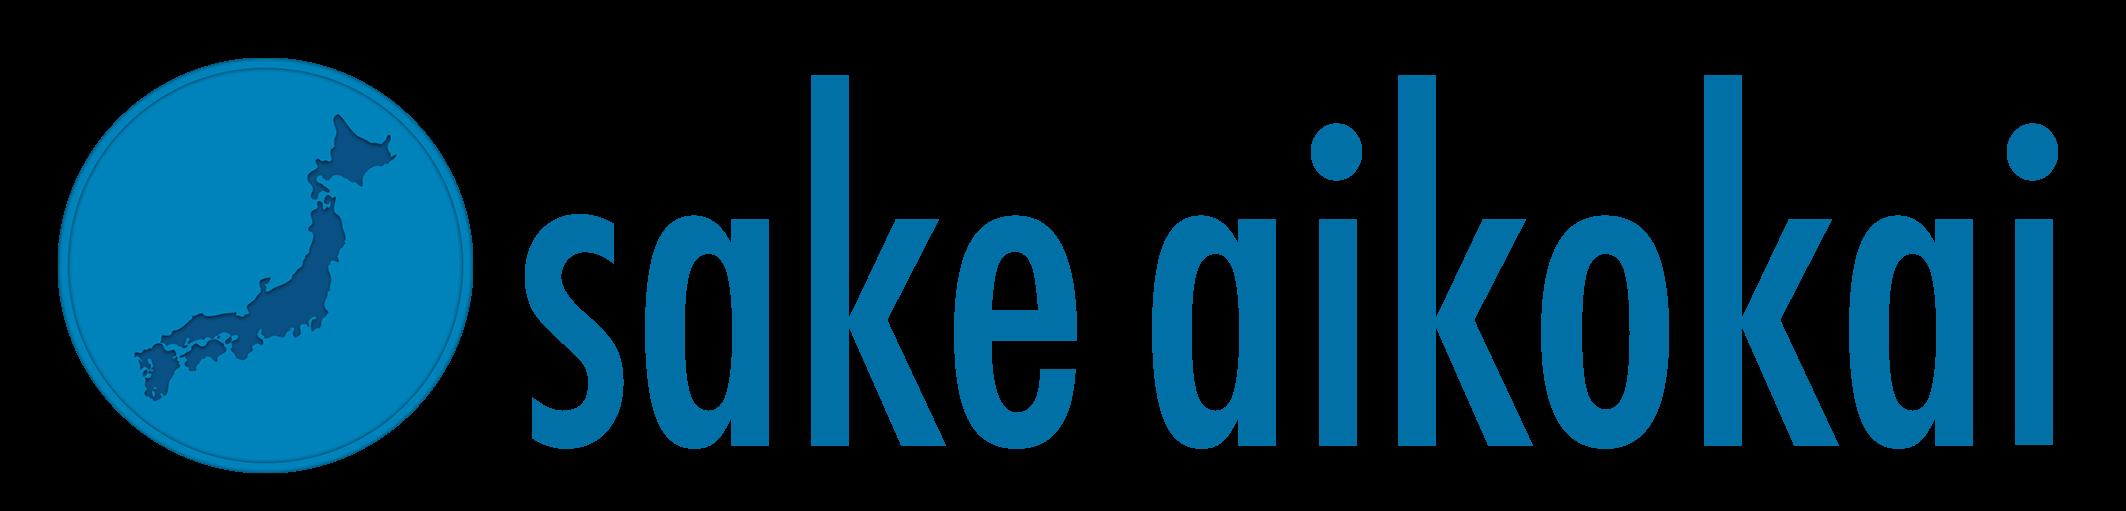 Sake Aikokai